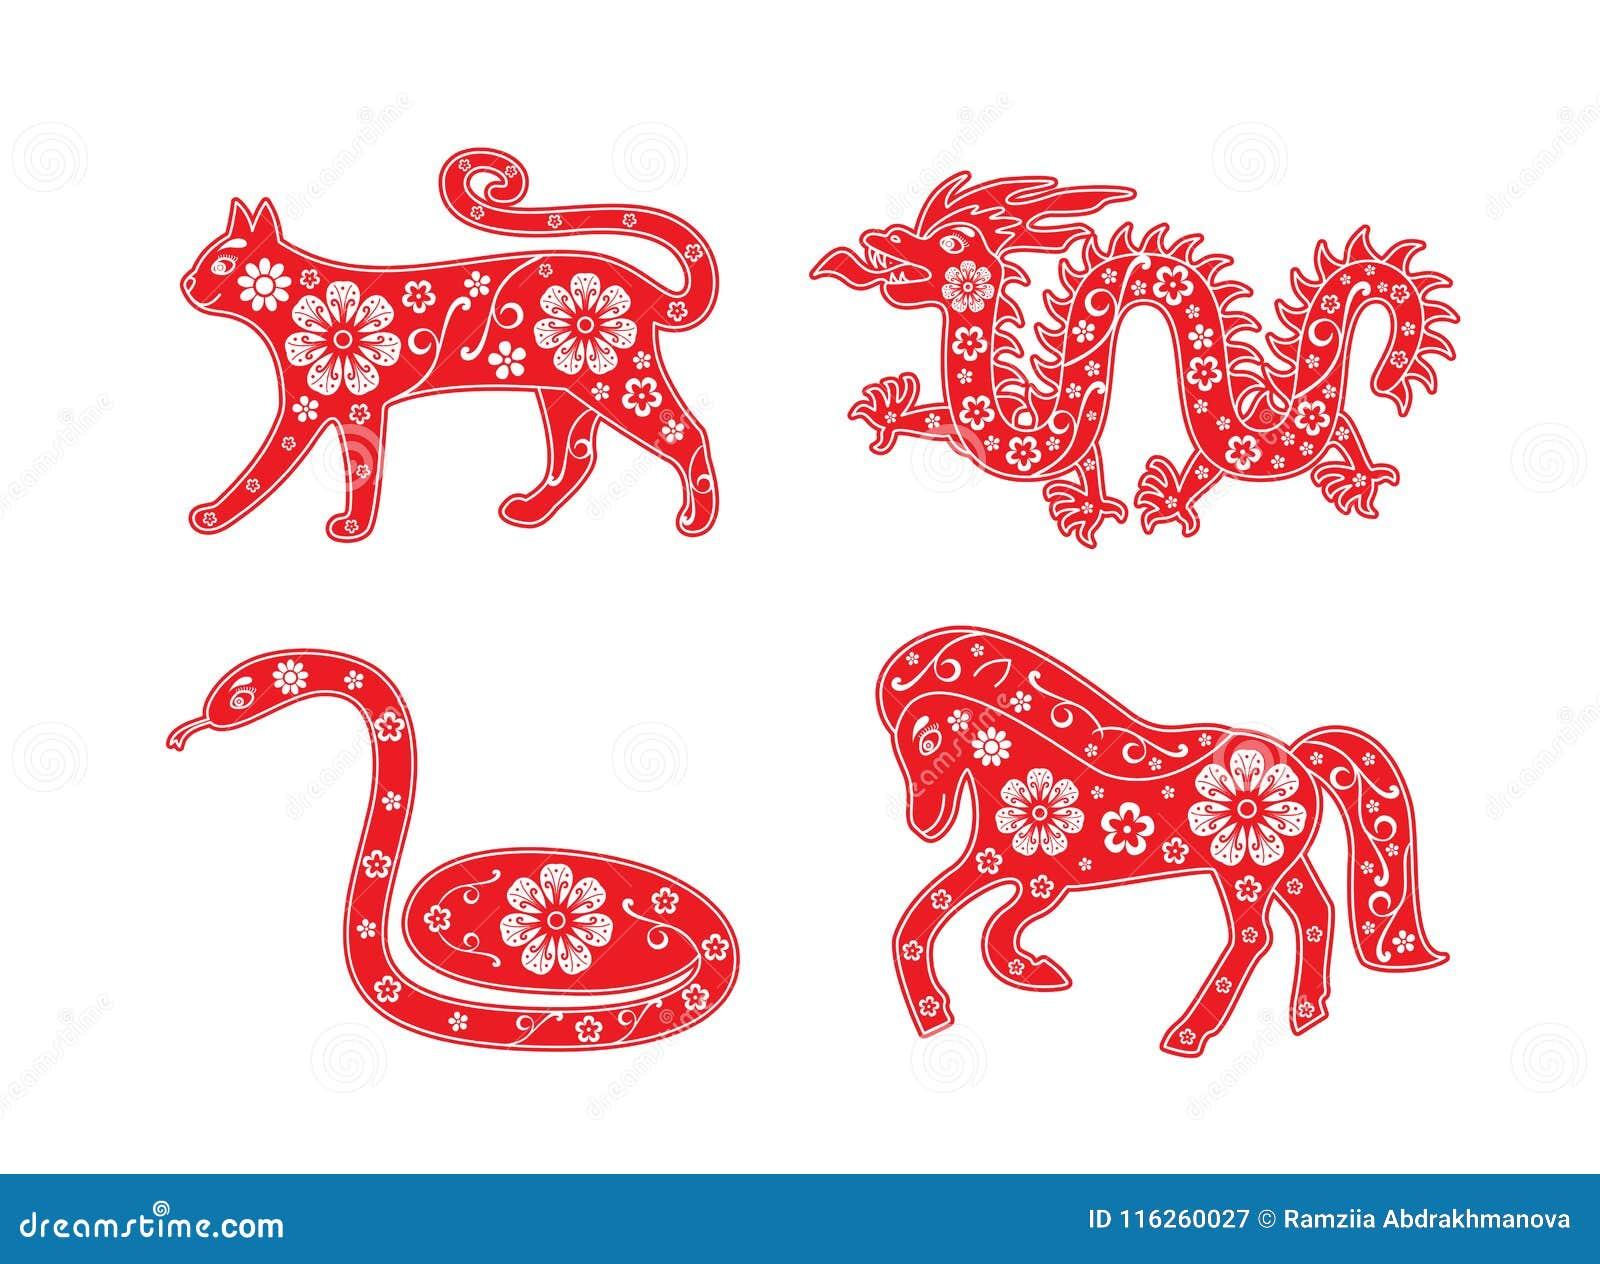 horoscope horse and snake